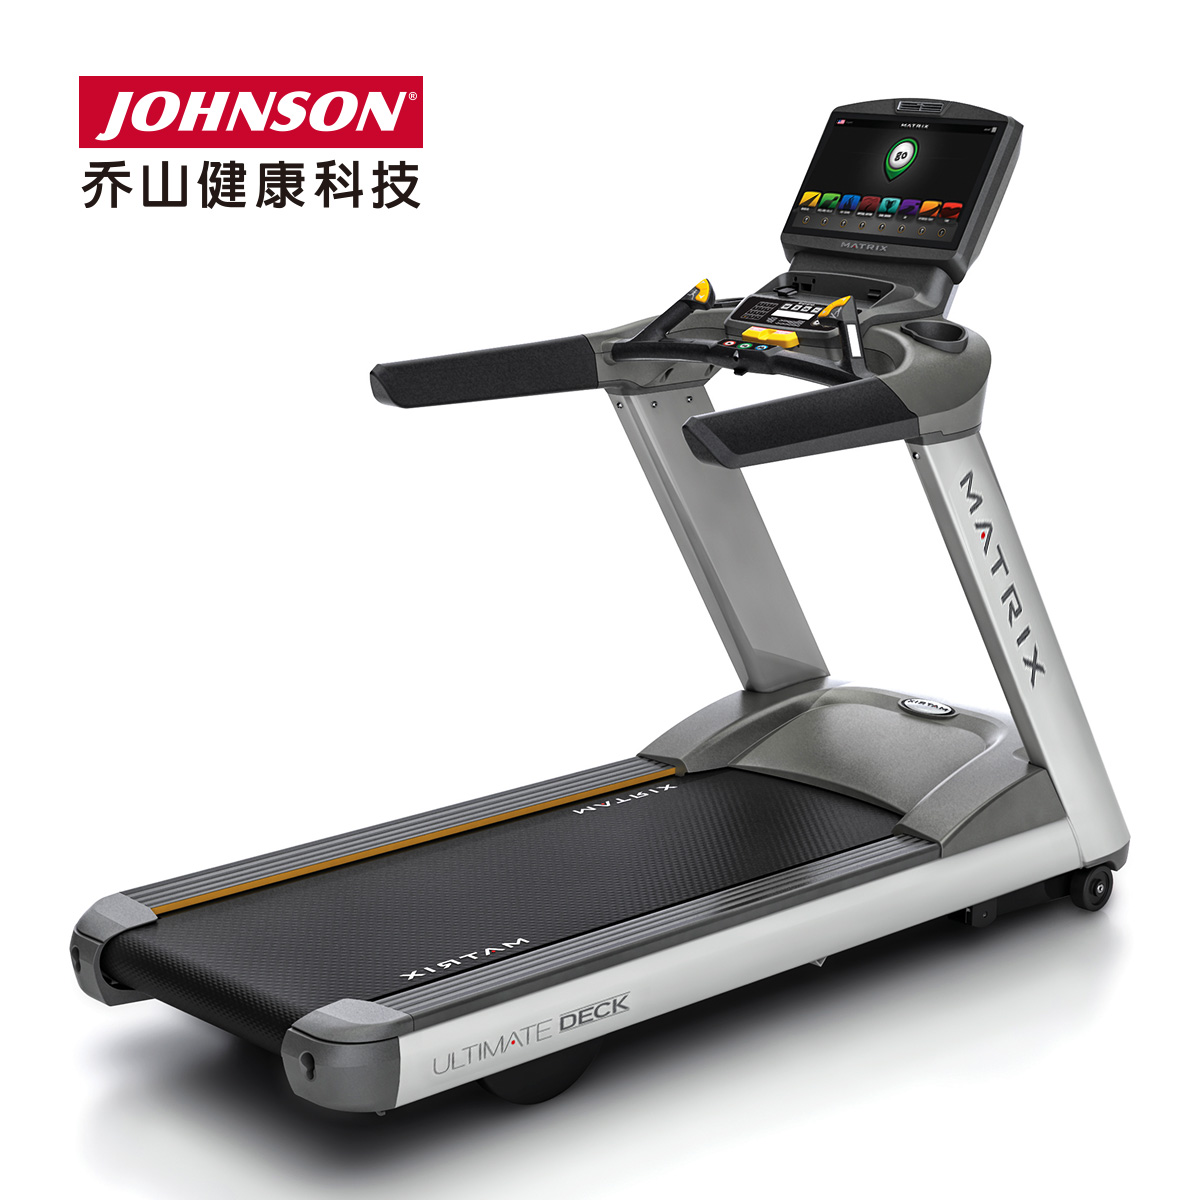 Johnson美国乔山IC7 商用动感单...